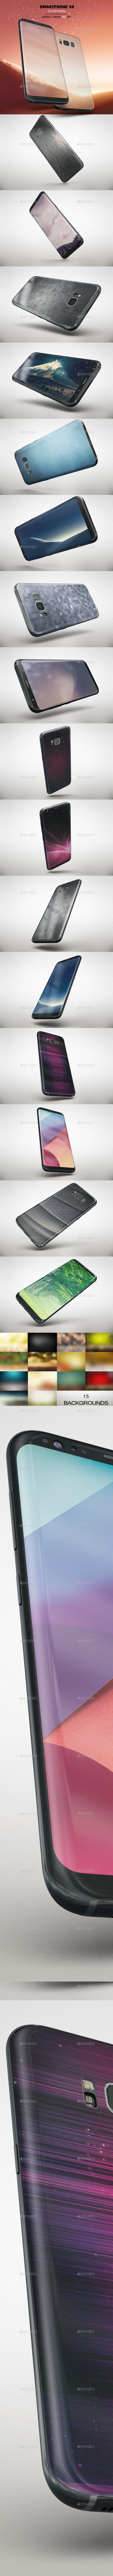 SmartPhone Galaxy S8 App & Skin MockUp - Product Mock-Ups Graphics